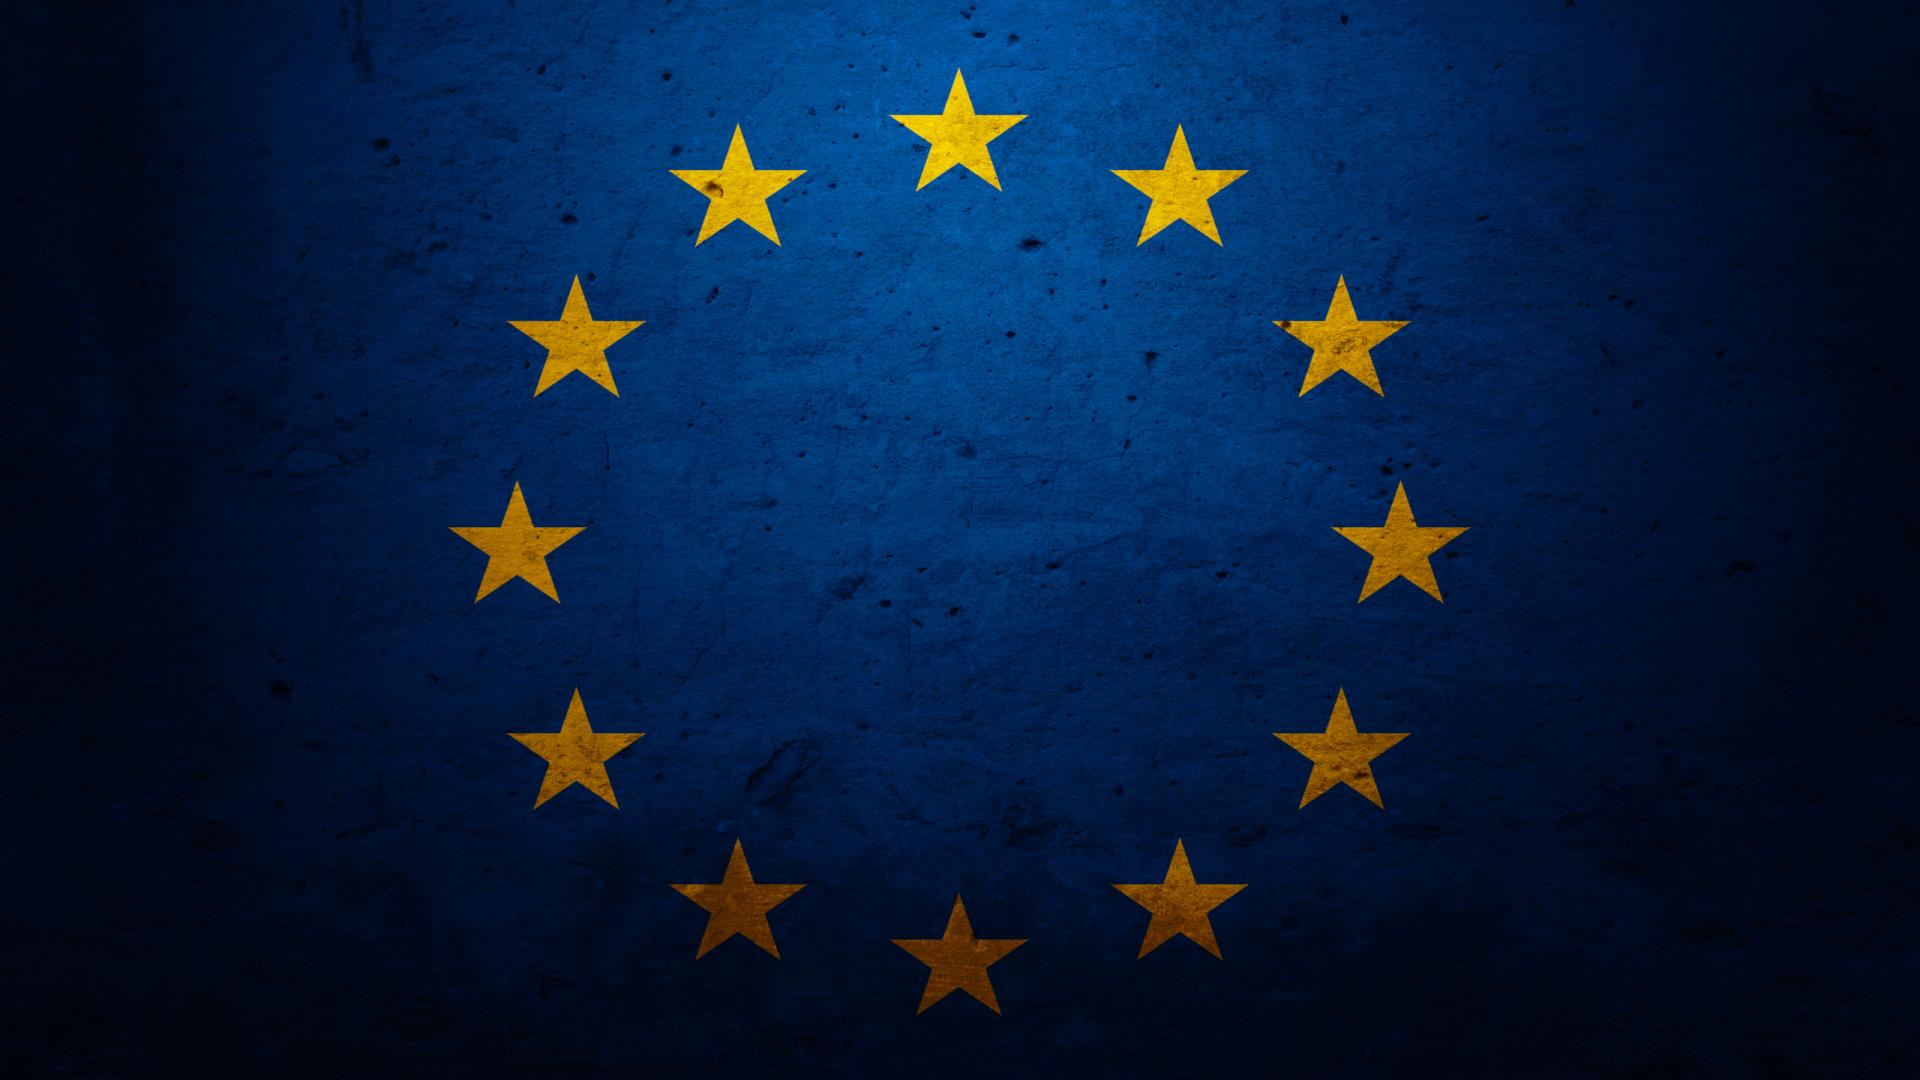 European Union Flag HD Wallpaper 1920x1080 ID60737 1920x1080